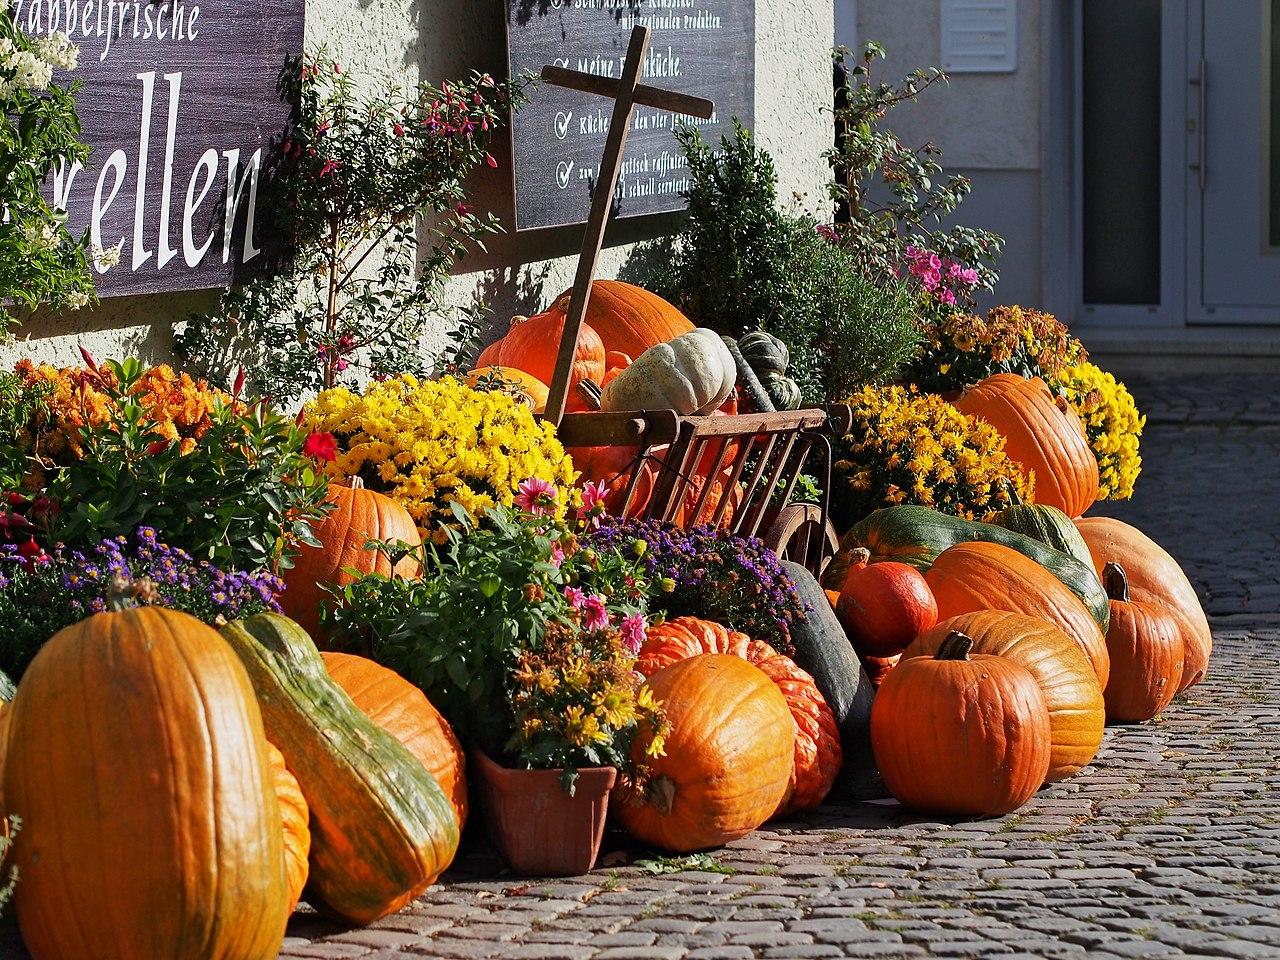 File:Pumpkin Decoration.jpg - Wikimedia Commons